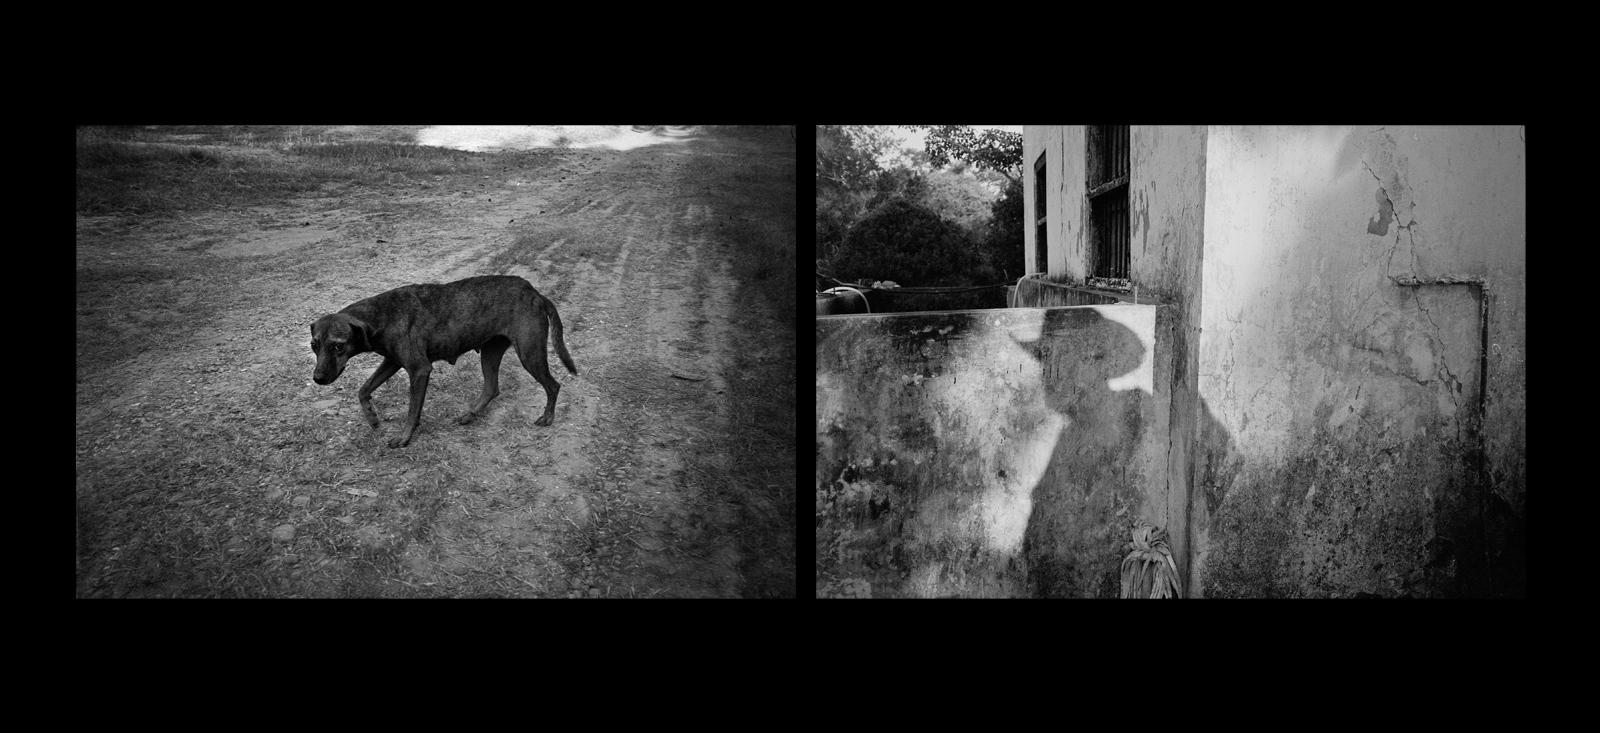 Art and Documentary Photography - Loading El_Perro_y_La_Sombra__sdeswaan.jpg